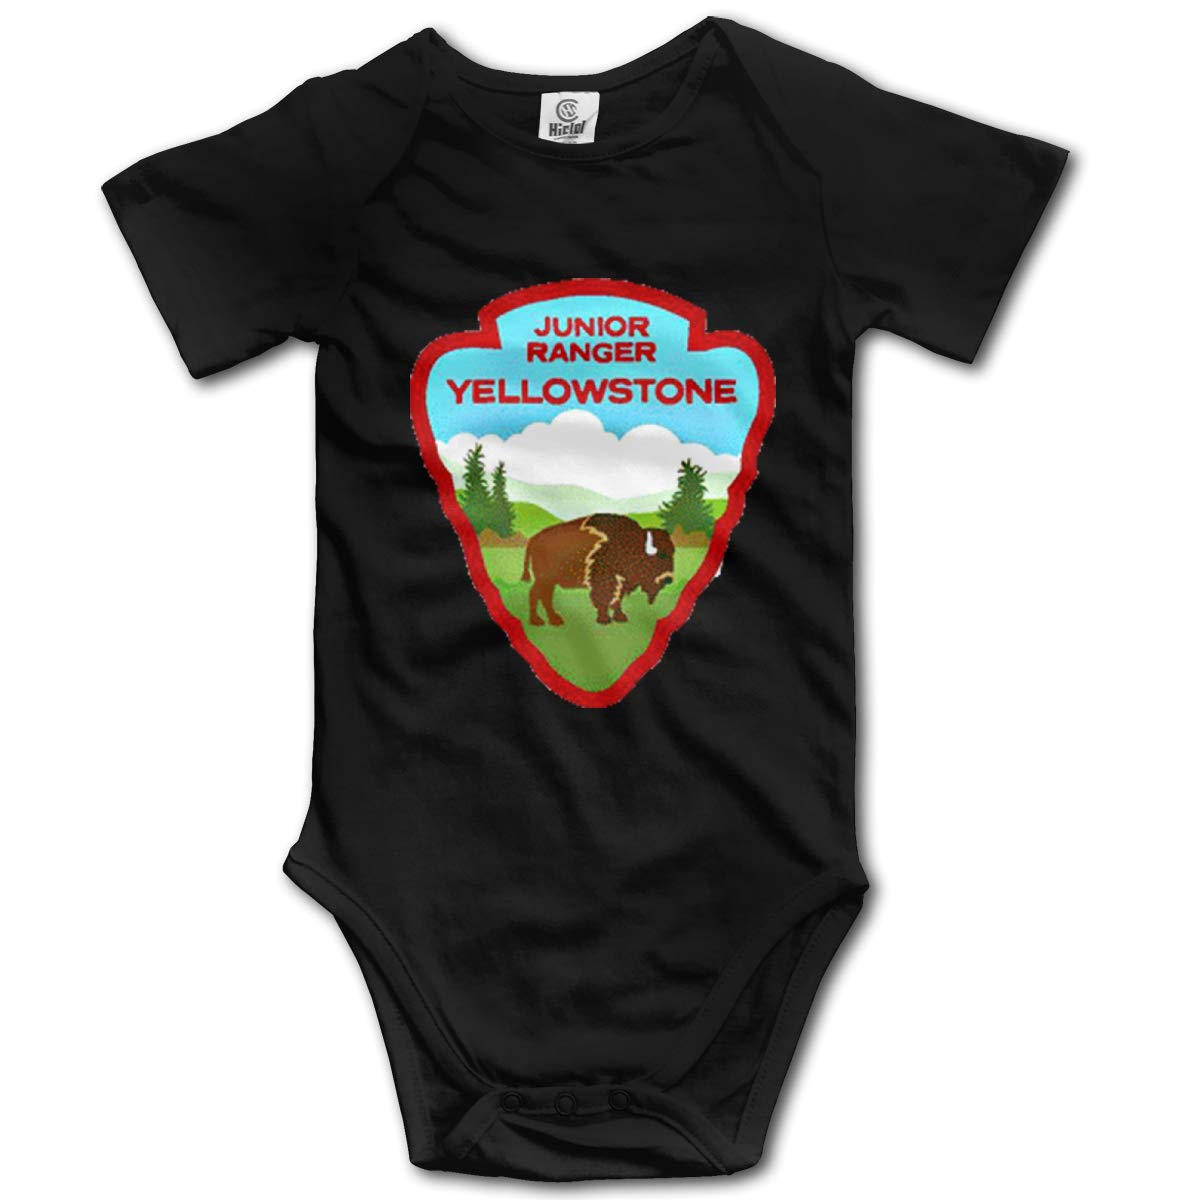 VANMASS Little Babys Yellowstone National Park Service Short Sleeve Climbing Bodysuits Playsuits